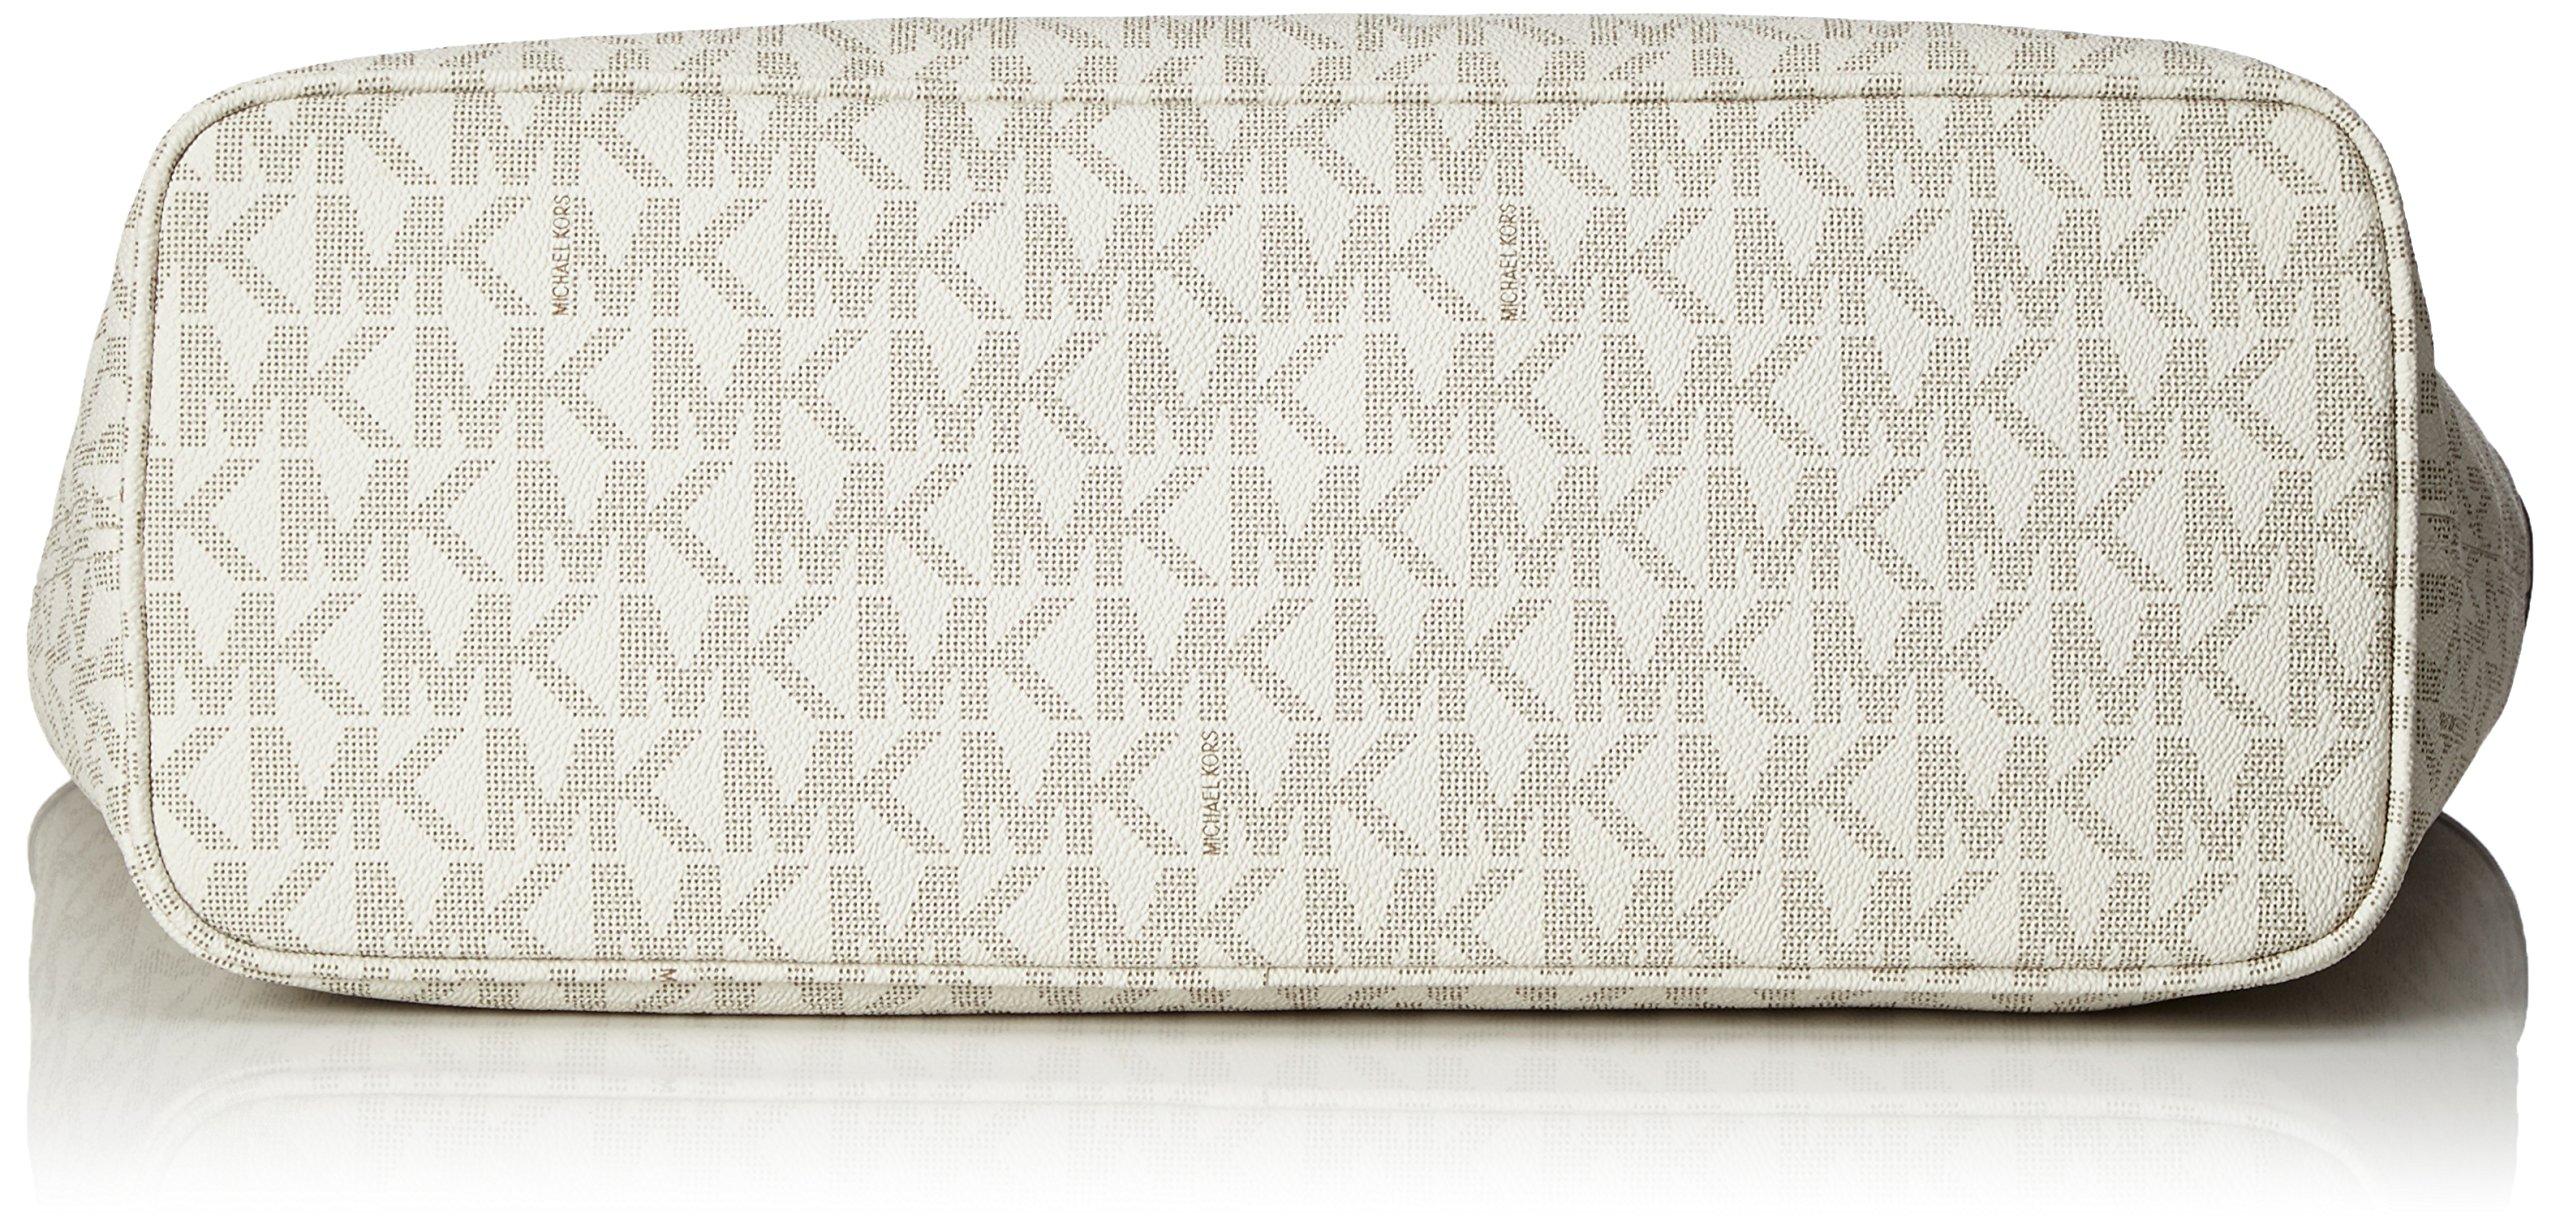 MICHAEL Michael Kors Jet Set Travel Medium Top Zip Multifunction Tote (Vanilla) by Michael Kors (Image #4)